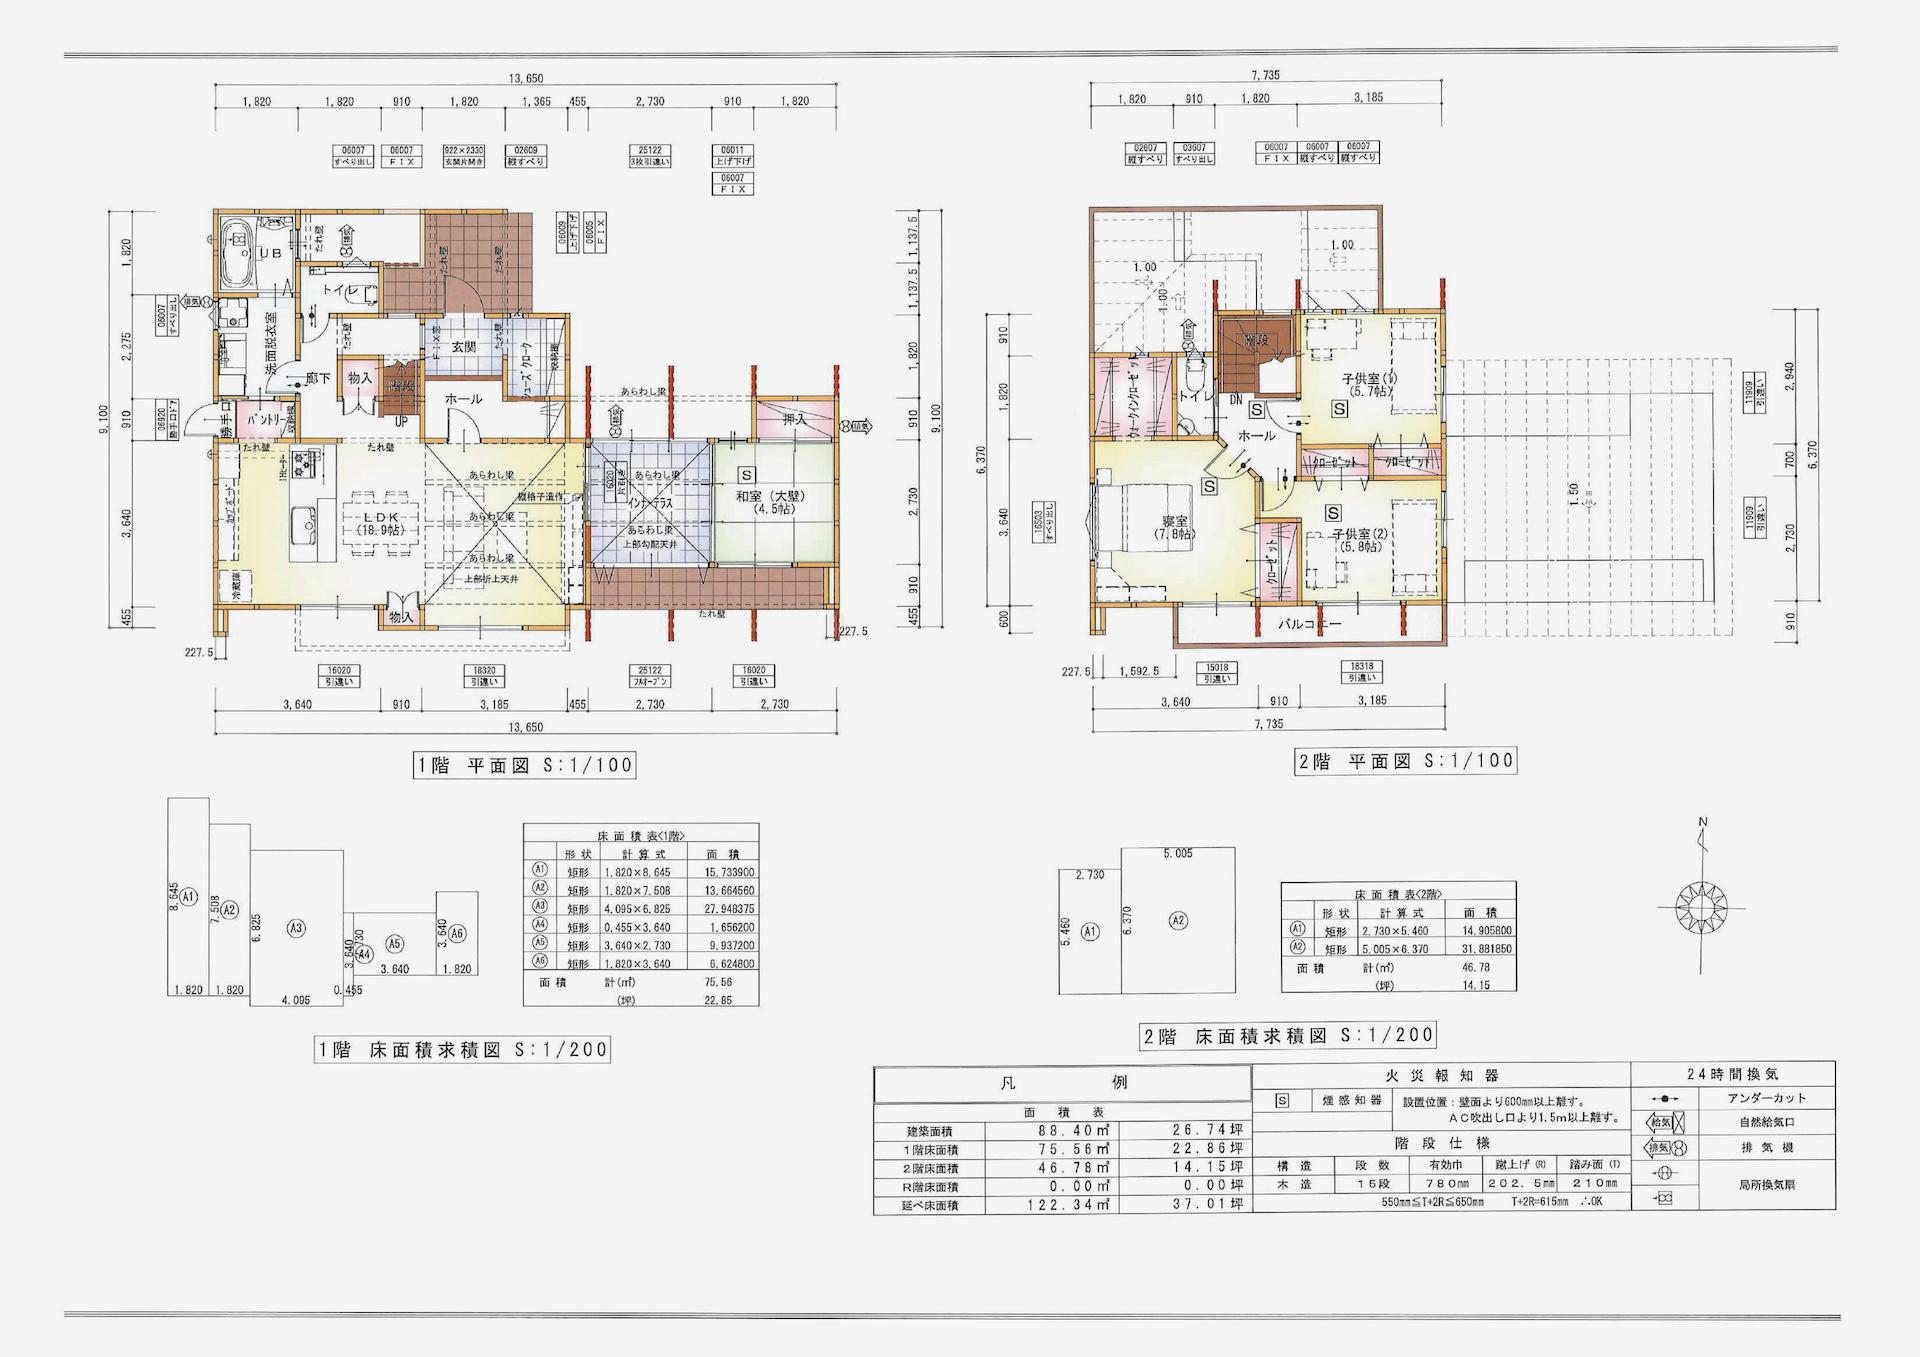 2_Plan_kuriya